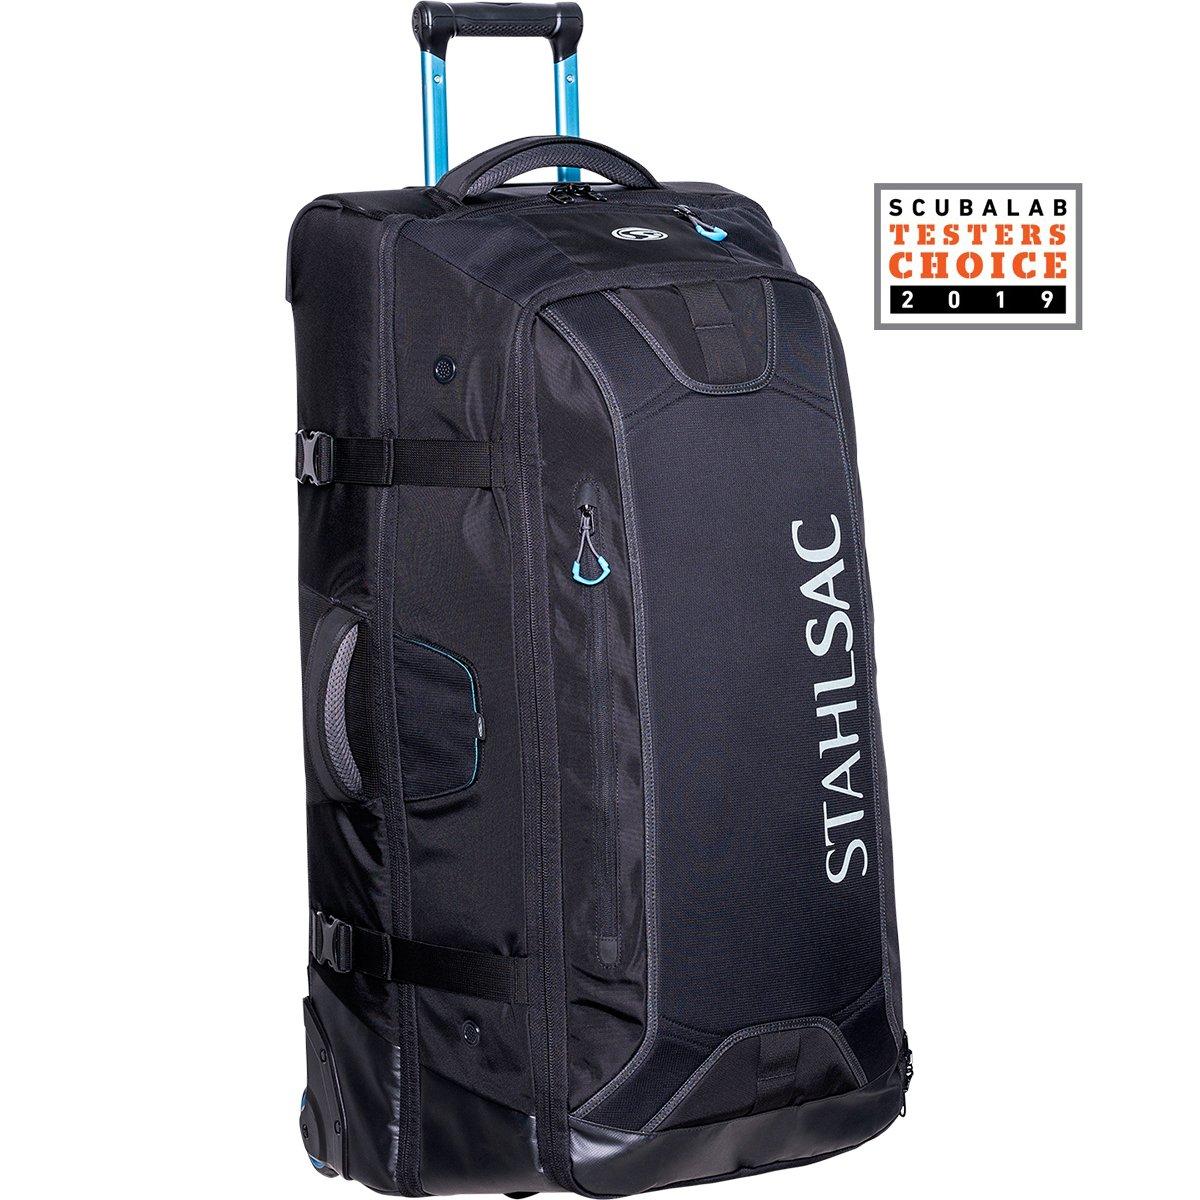 Gear Bag Roller Duffel, Steel 34 DryRoller